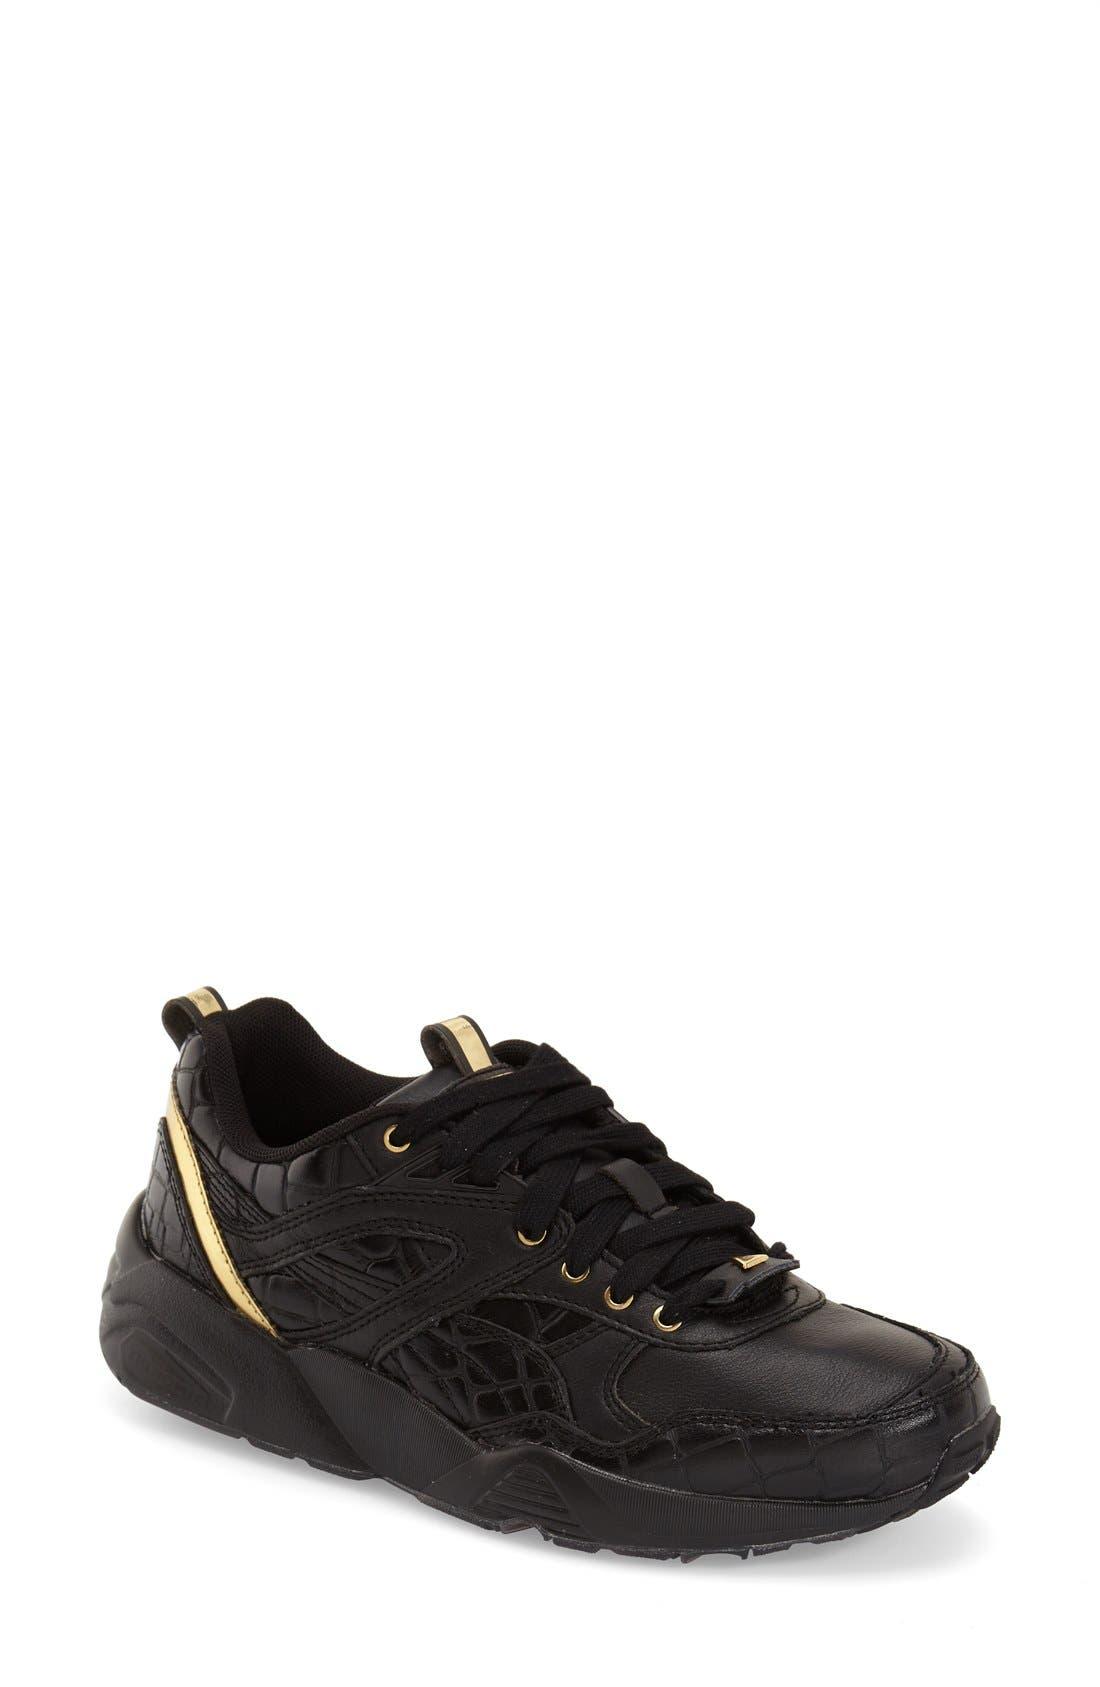 Main Image - PUMA 'Trinomic R698 Exotic' Sneaker (Women)